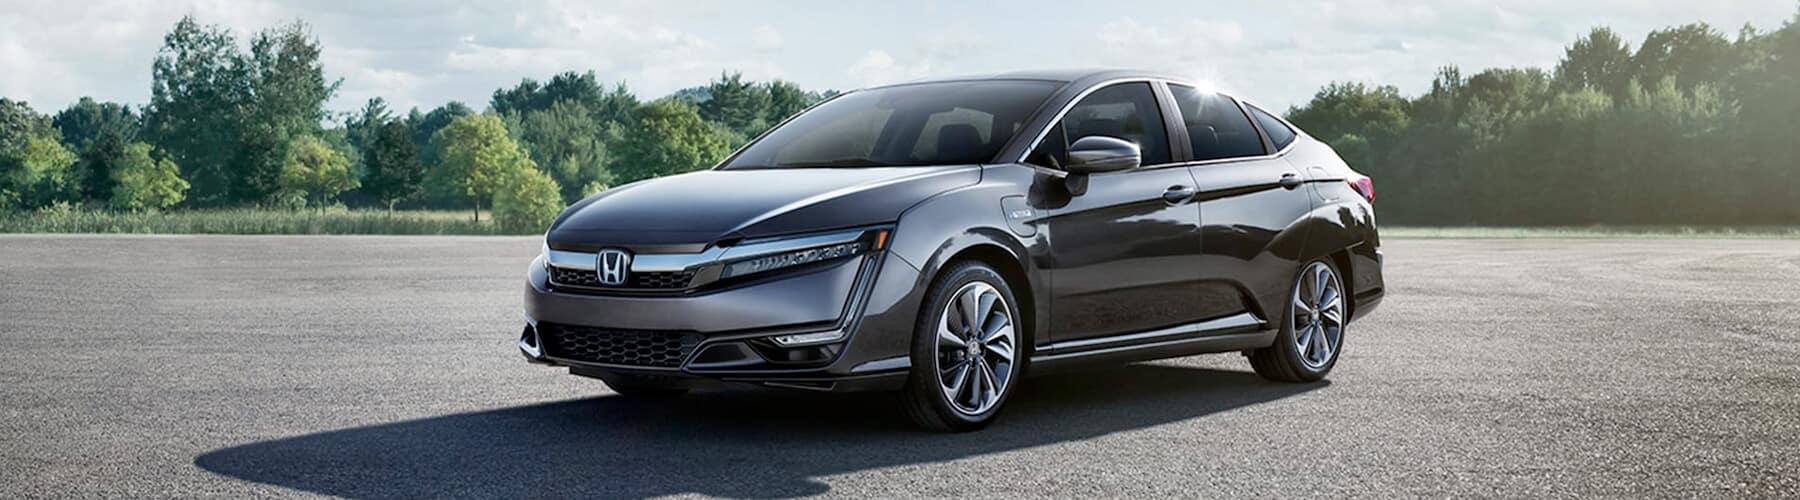 2020 Honda Clarity Plug-In Hybrid Slider